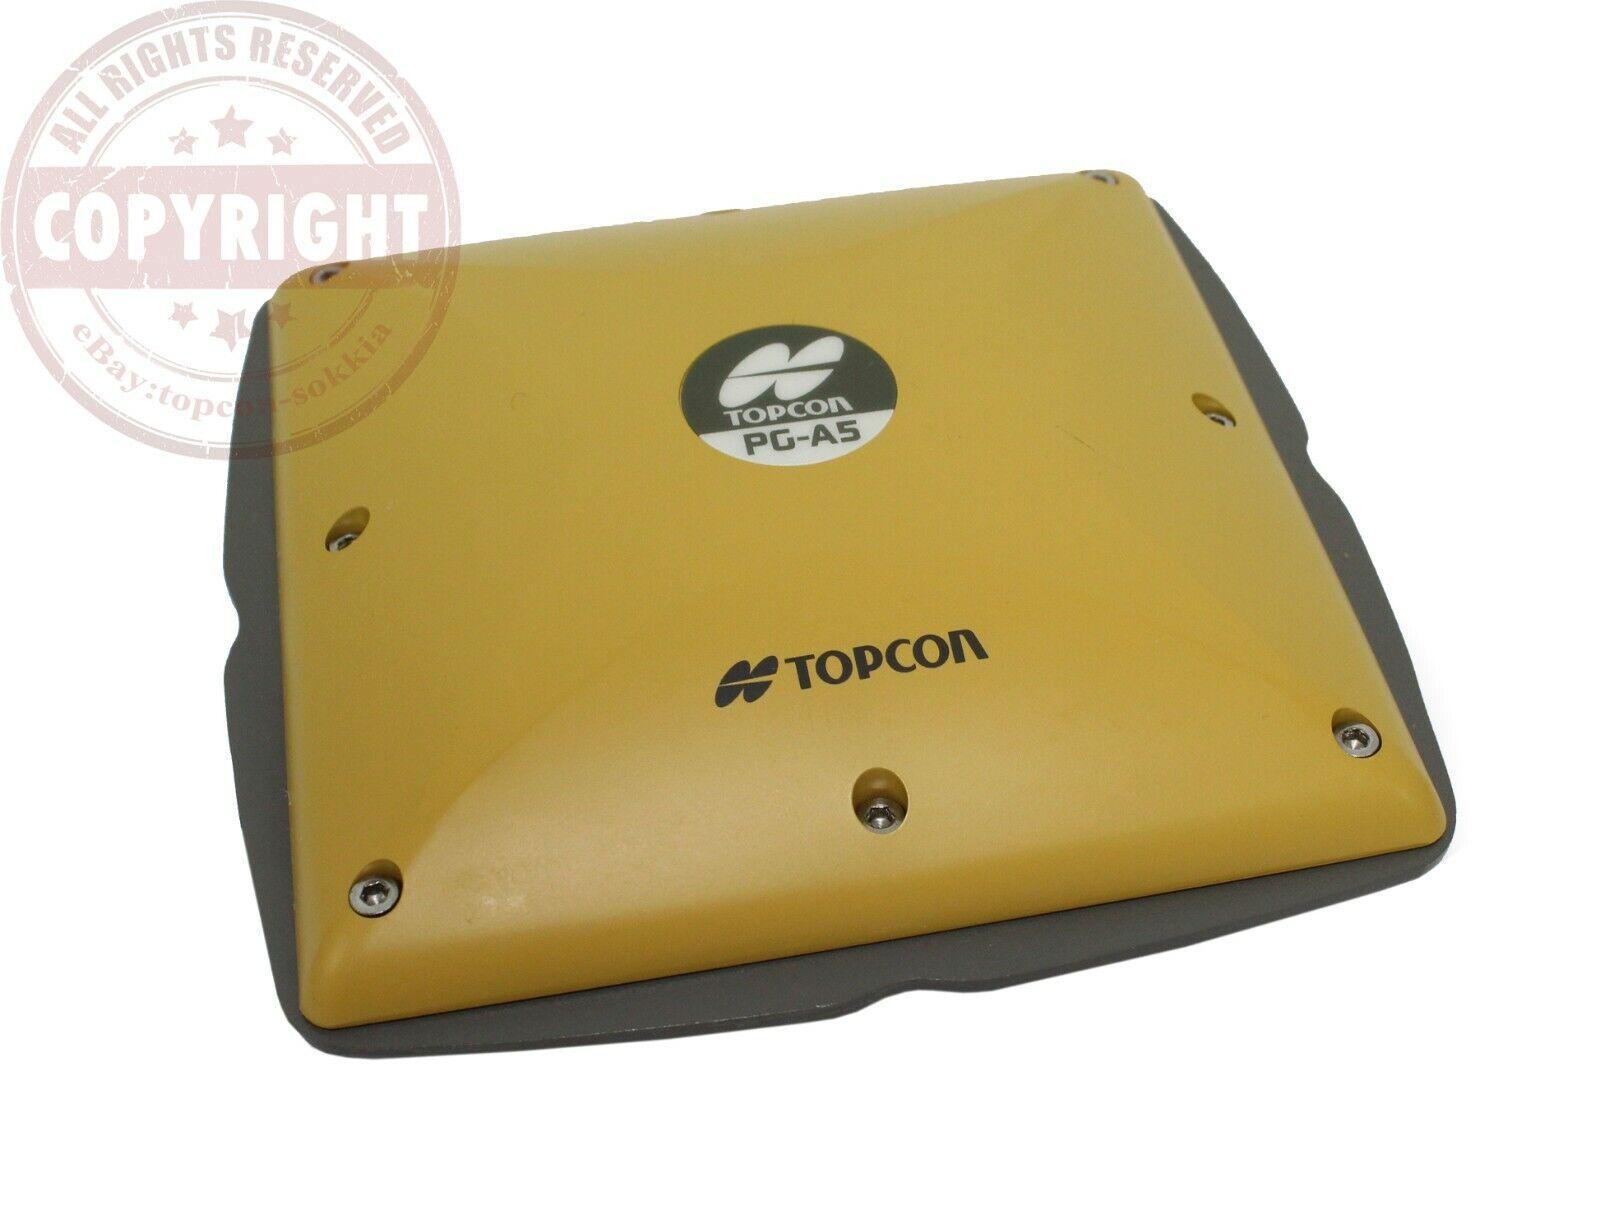 TOPCON PG-A5 GPS ANTENNA,GLONASS,SURVEYING,RTK,MACHINE CONTROL,01-840201-05